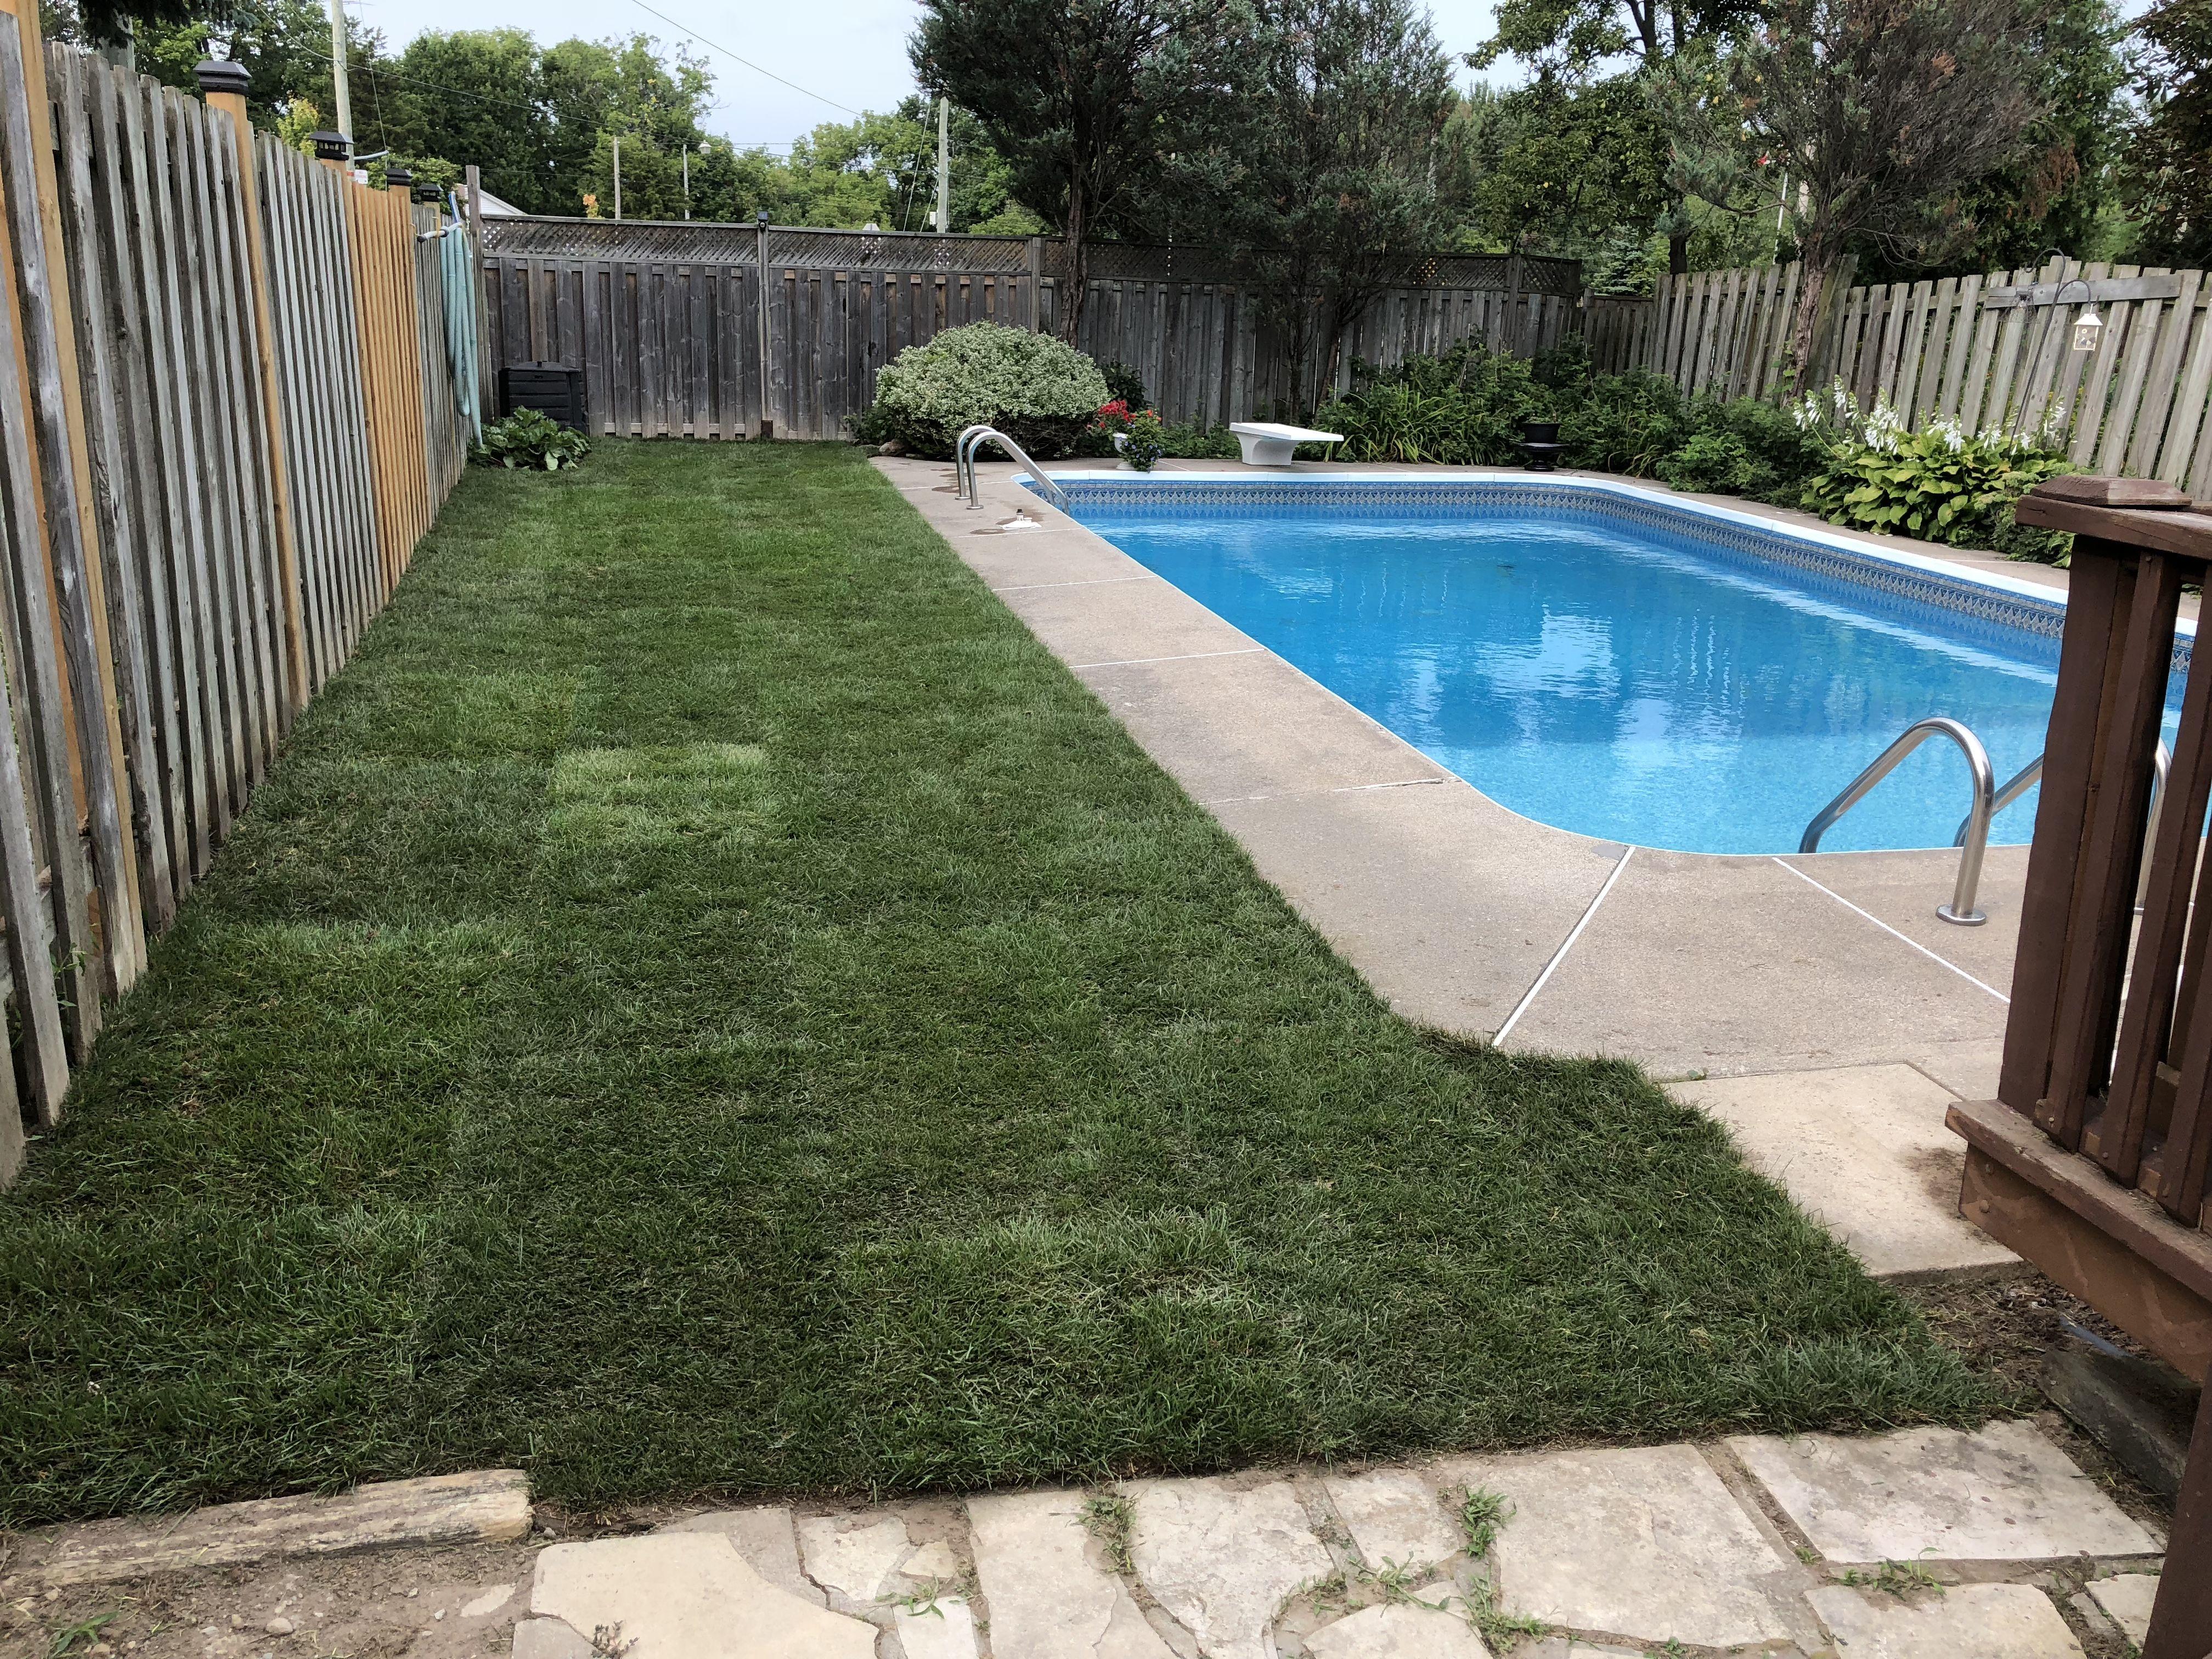 Pool Sod Installation Markham Lawn replacement Sodding My